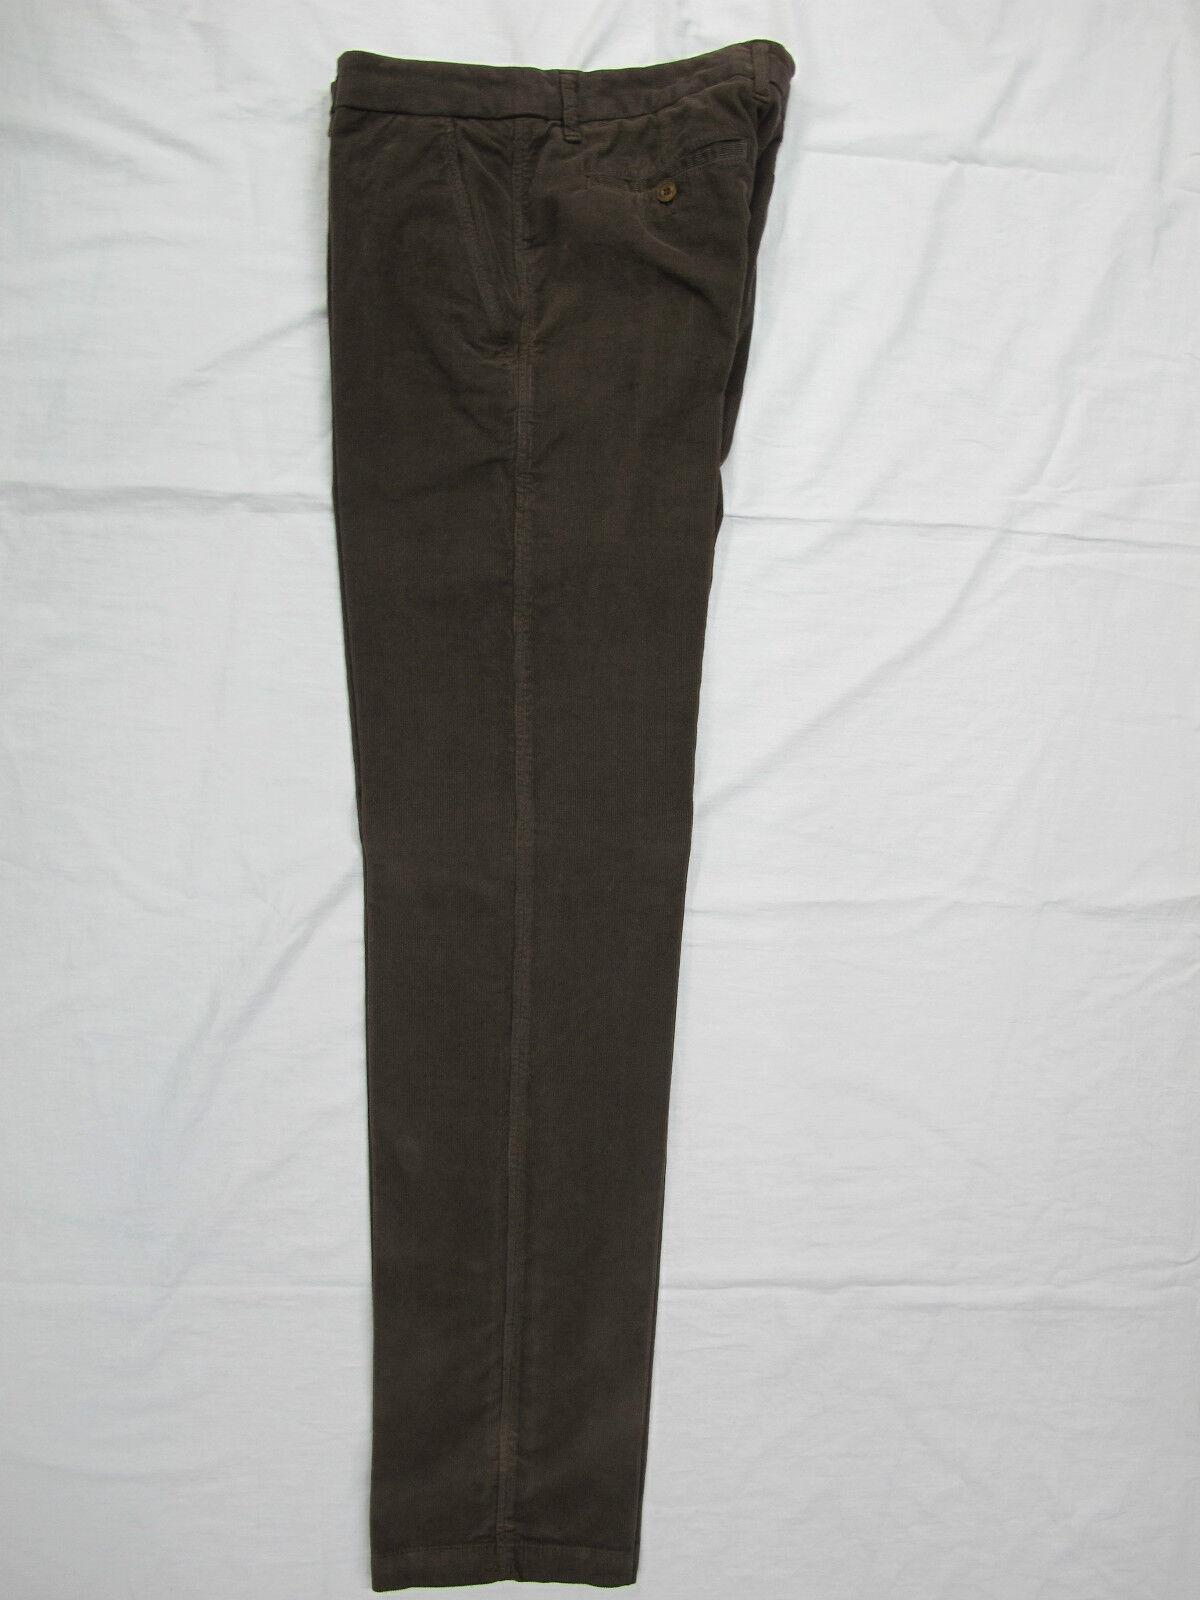 HARMONT&BLAINE pantaloni uomo velluto mod.W3016 col.MarroneeE tg.52 inverno 2013